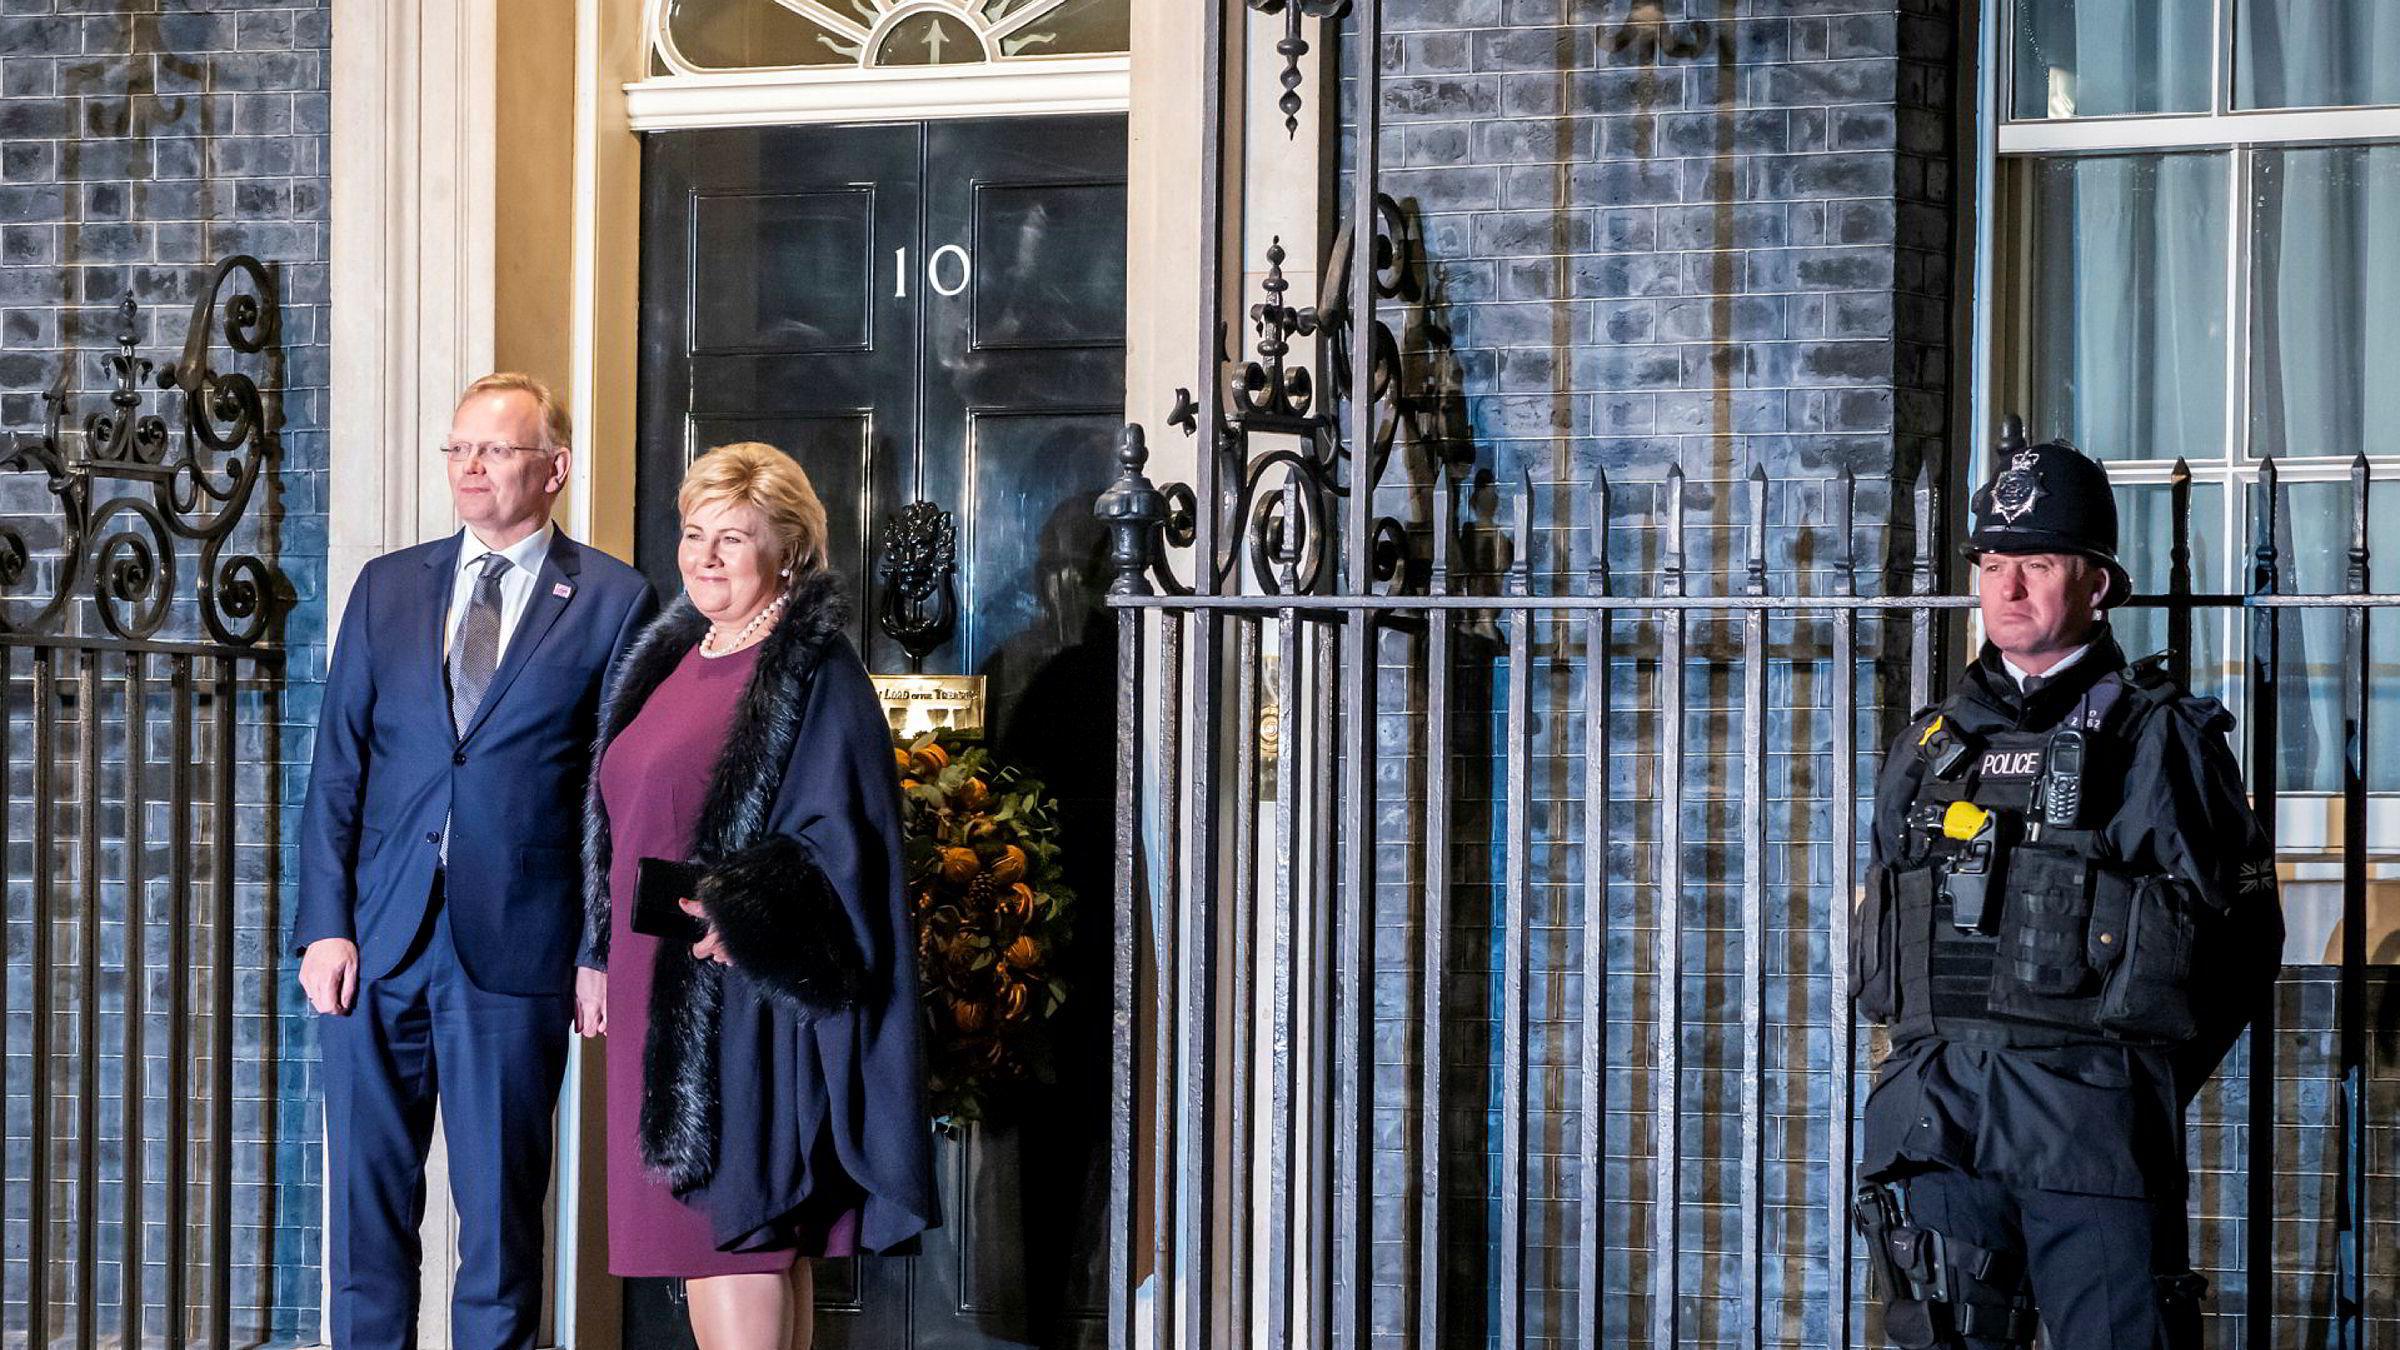 Statsminister Erna Solberg foran den britiske statsministerboligen i 10 Downing Street i London, sammen med mannen Sindre Finnes.